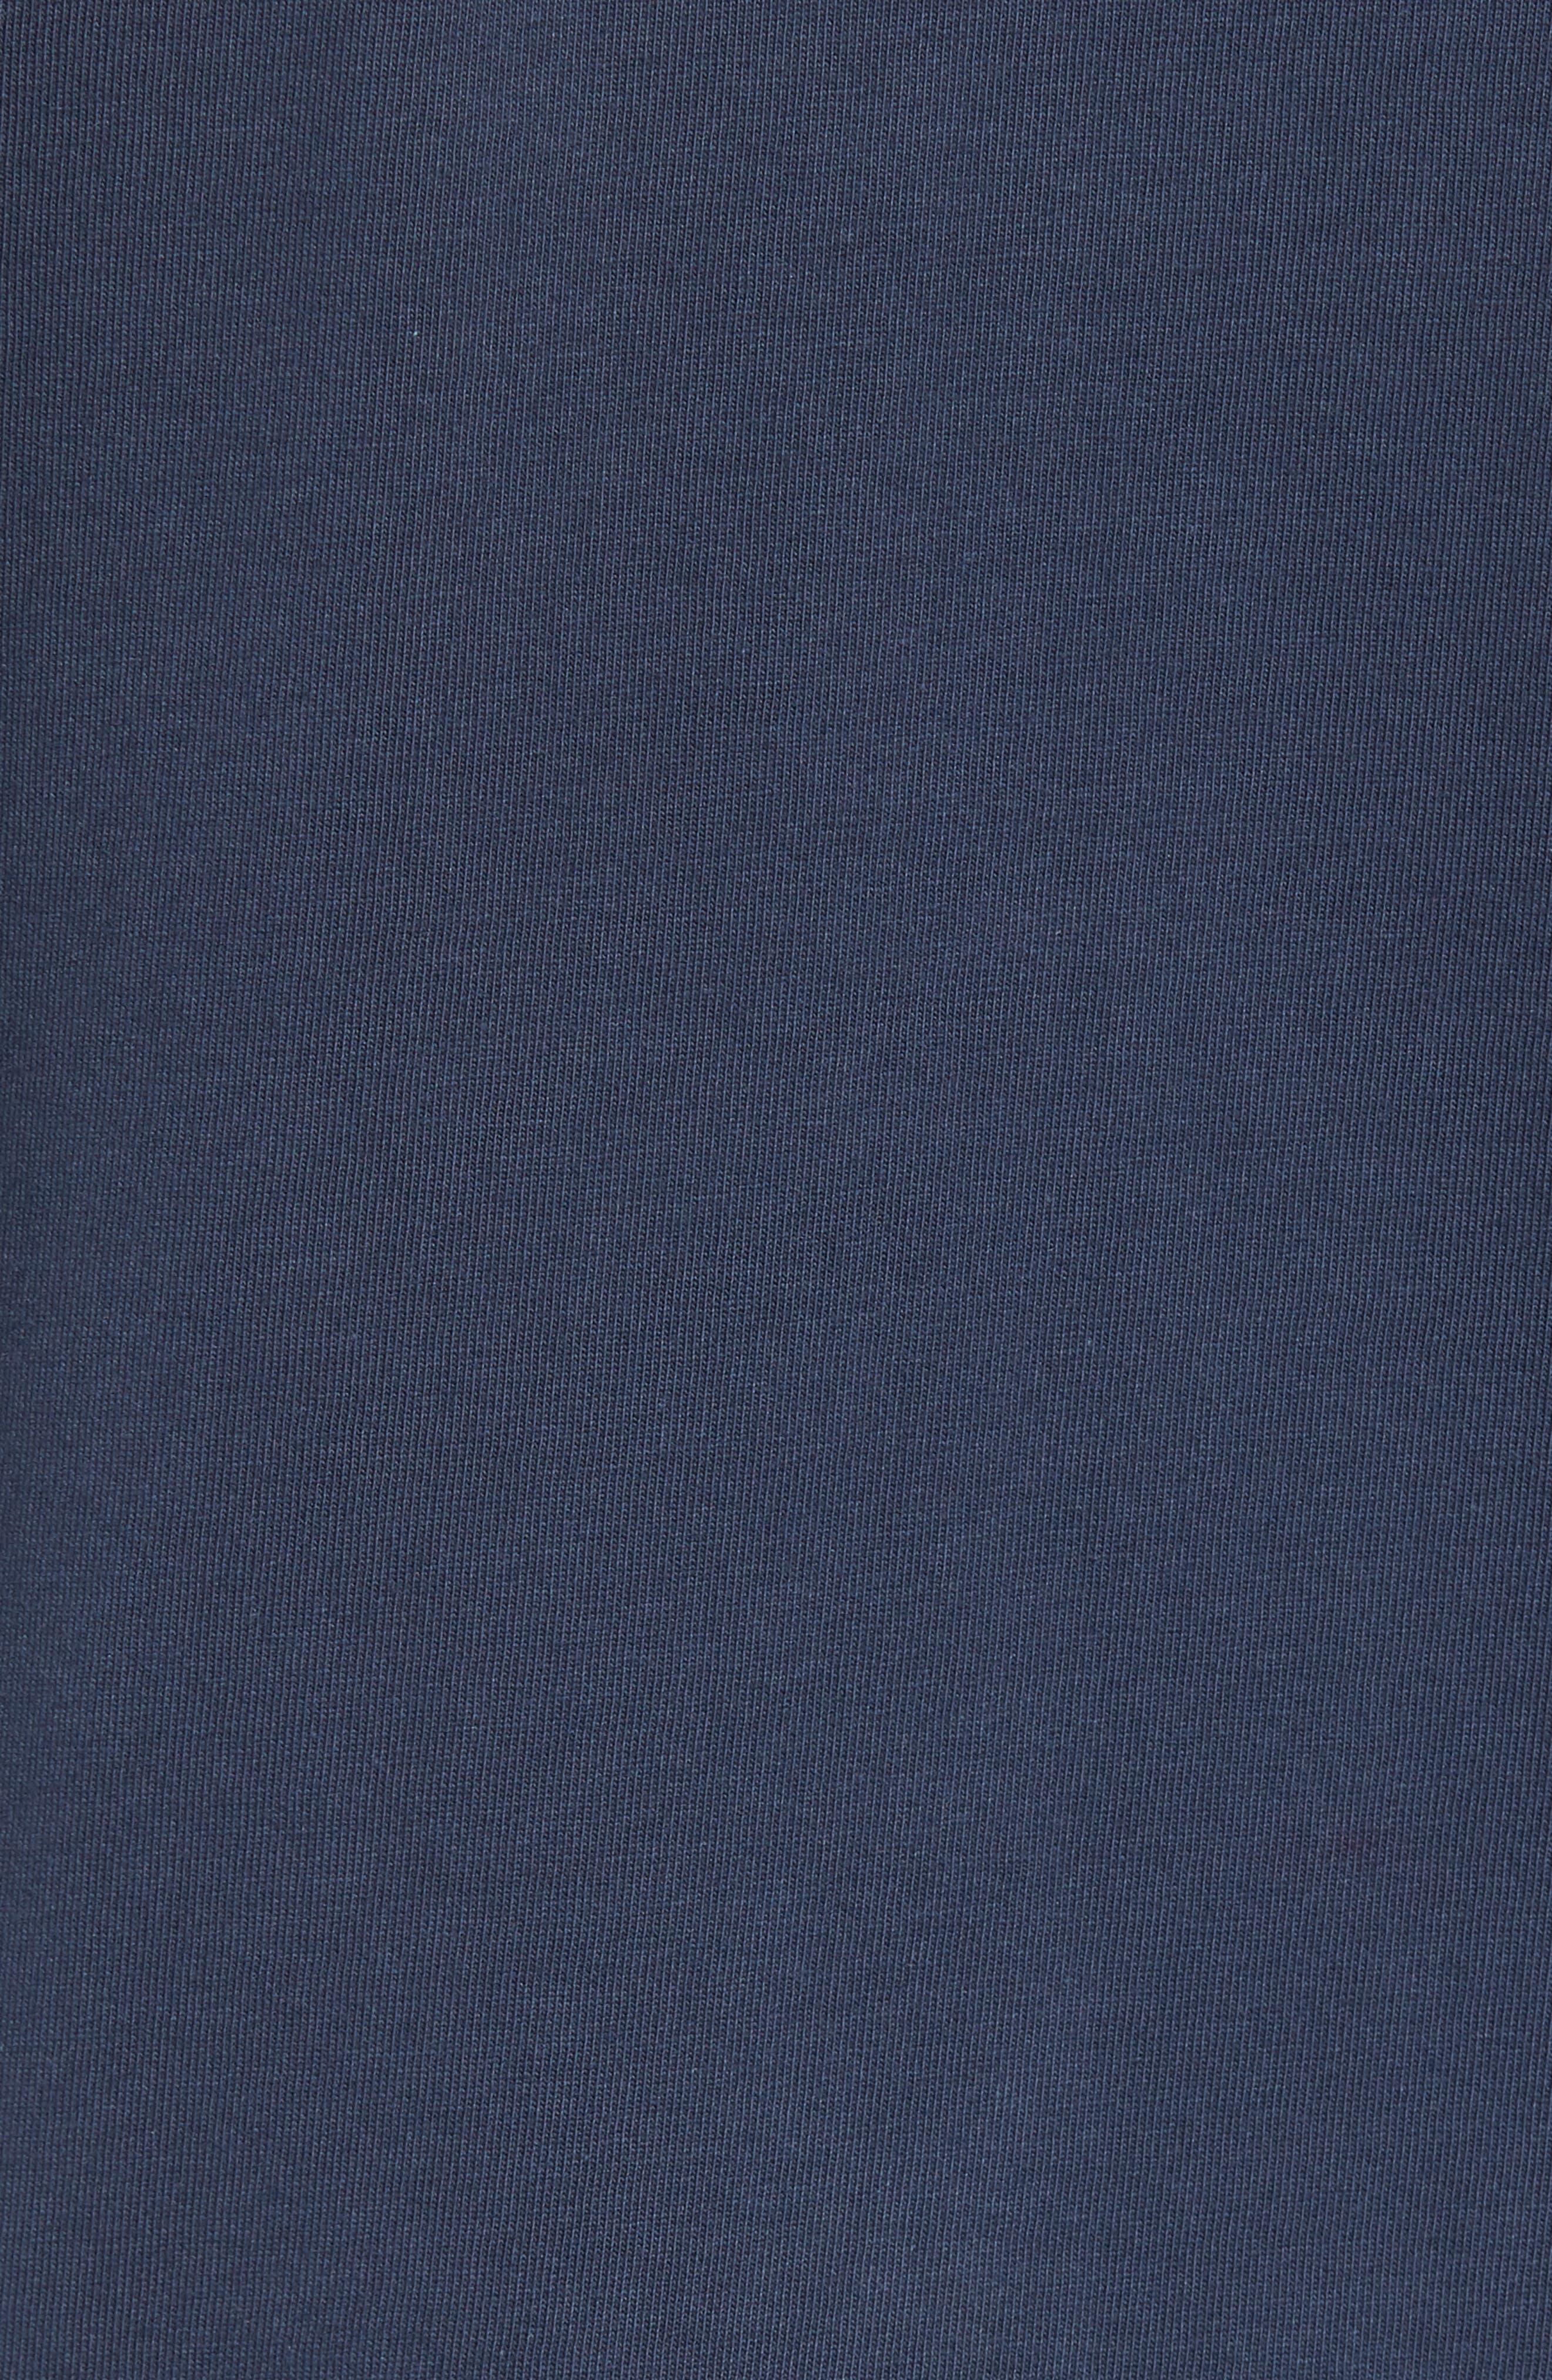 x Shark Week<sup>™</sup> Logo Long Sleeve Pocket T-Shirt,                             Alternate thumbnail 5, color,                             Vineyard Navy